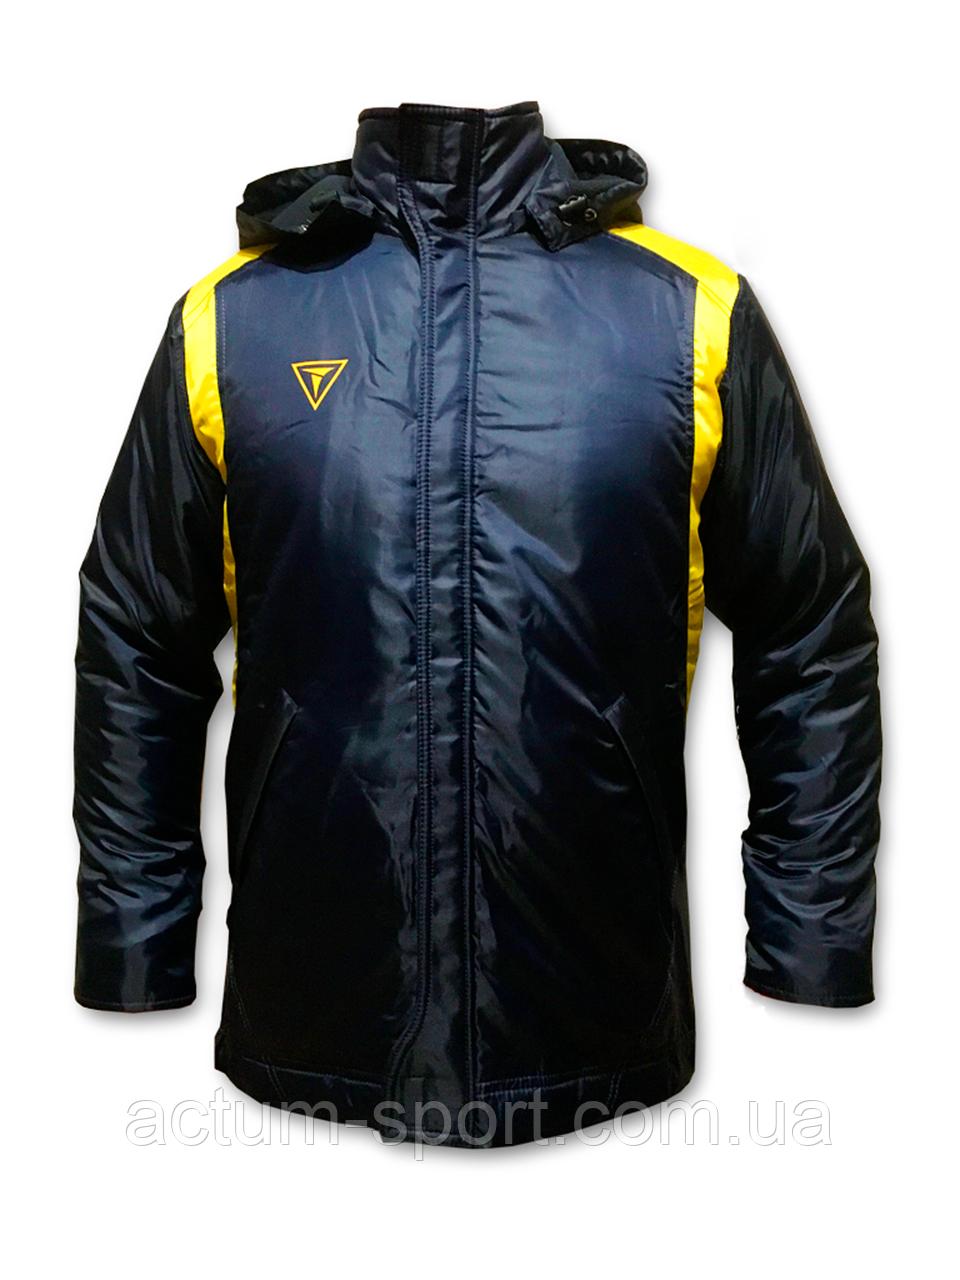 Куртка теплая с капюшоном Dinamo Titar  152